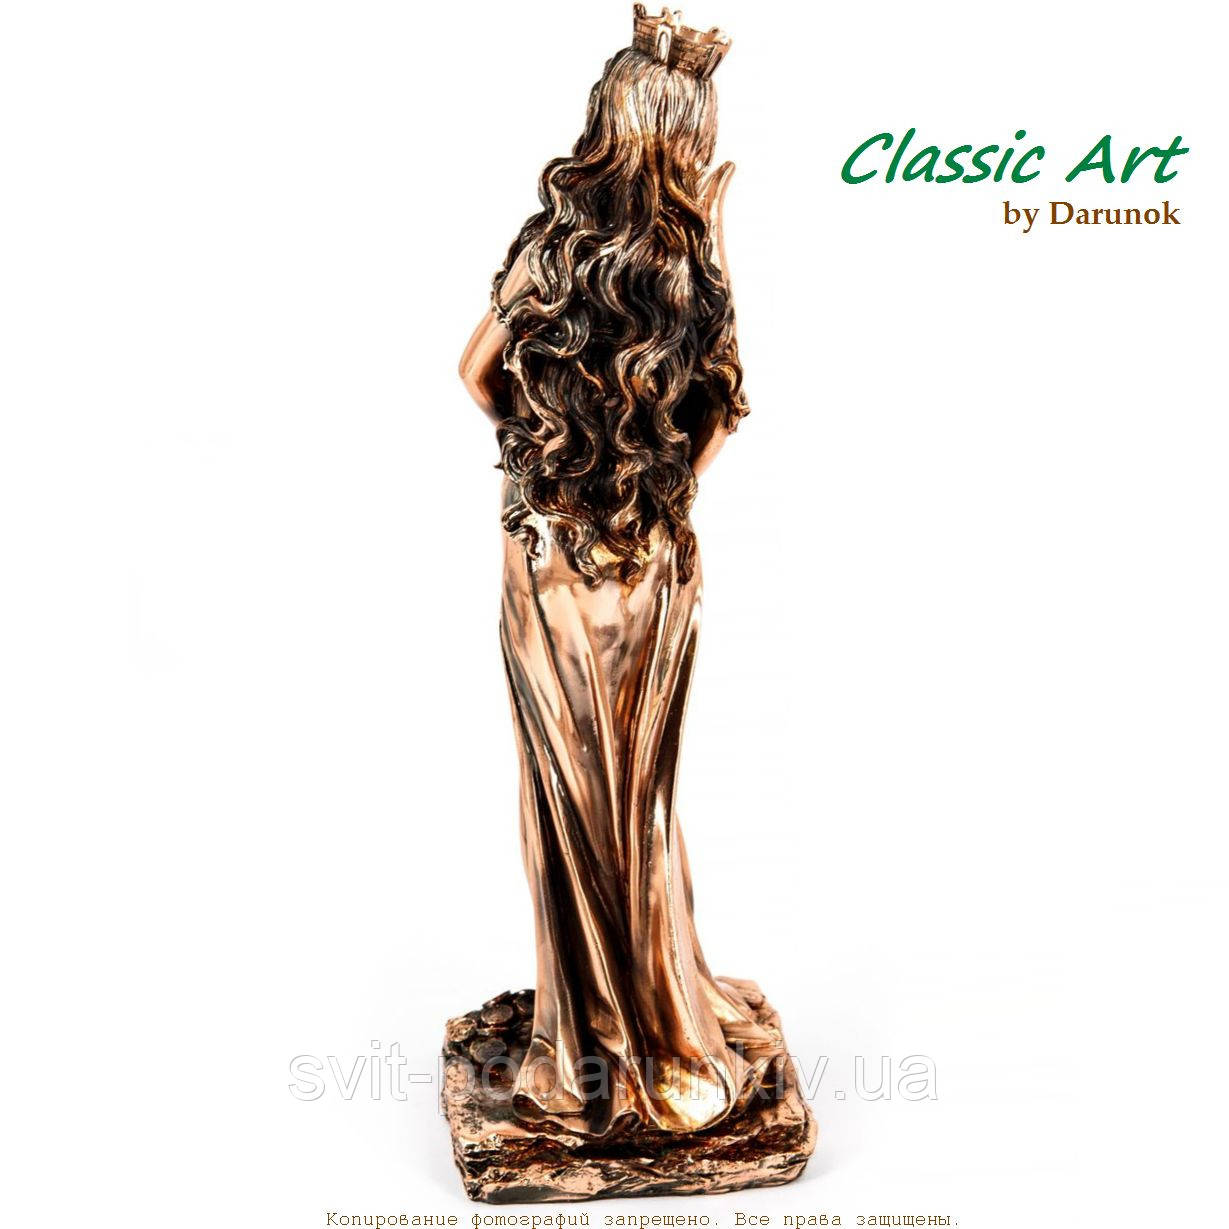 Статуэтка богини удачи Фортуны